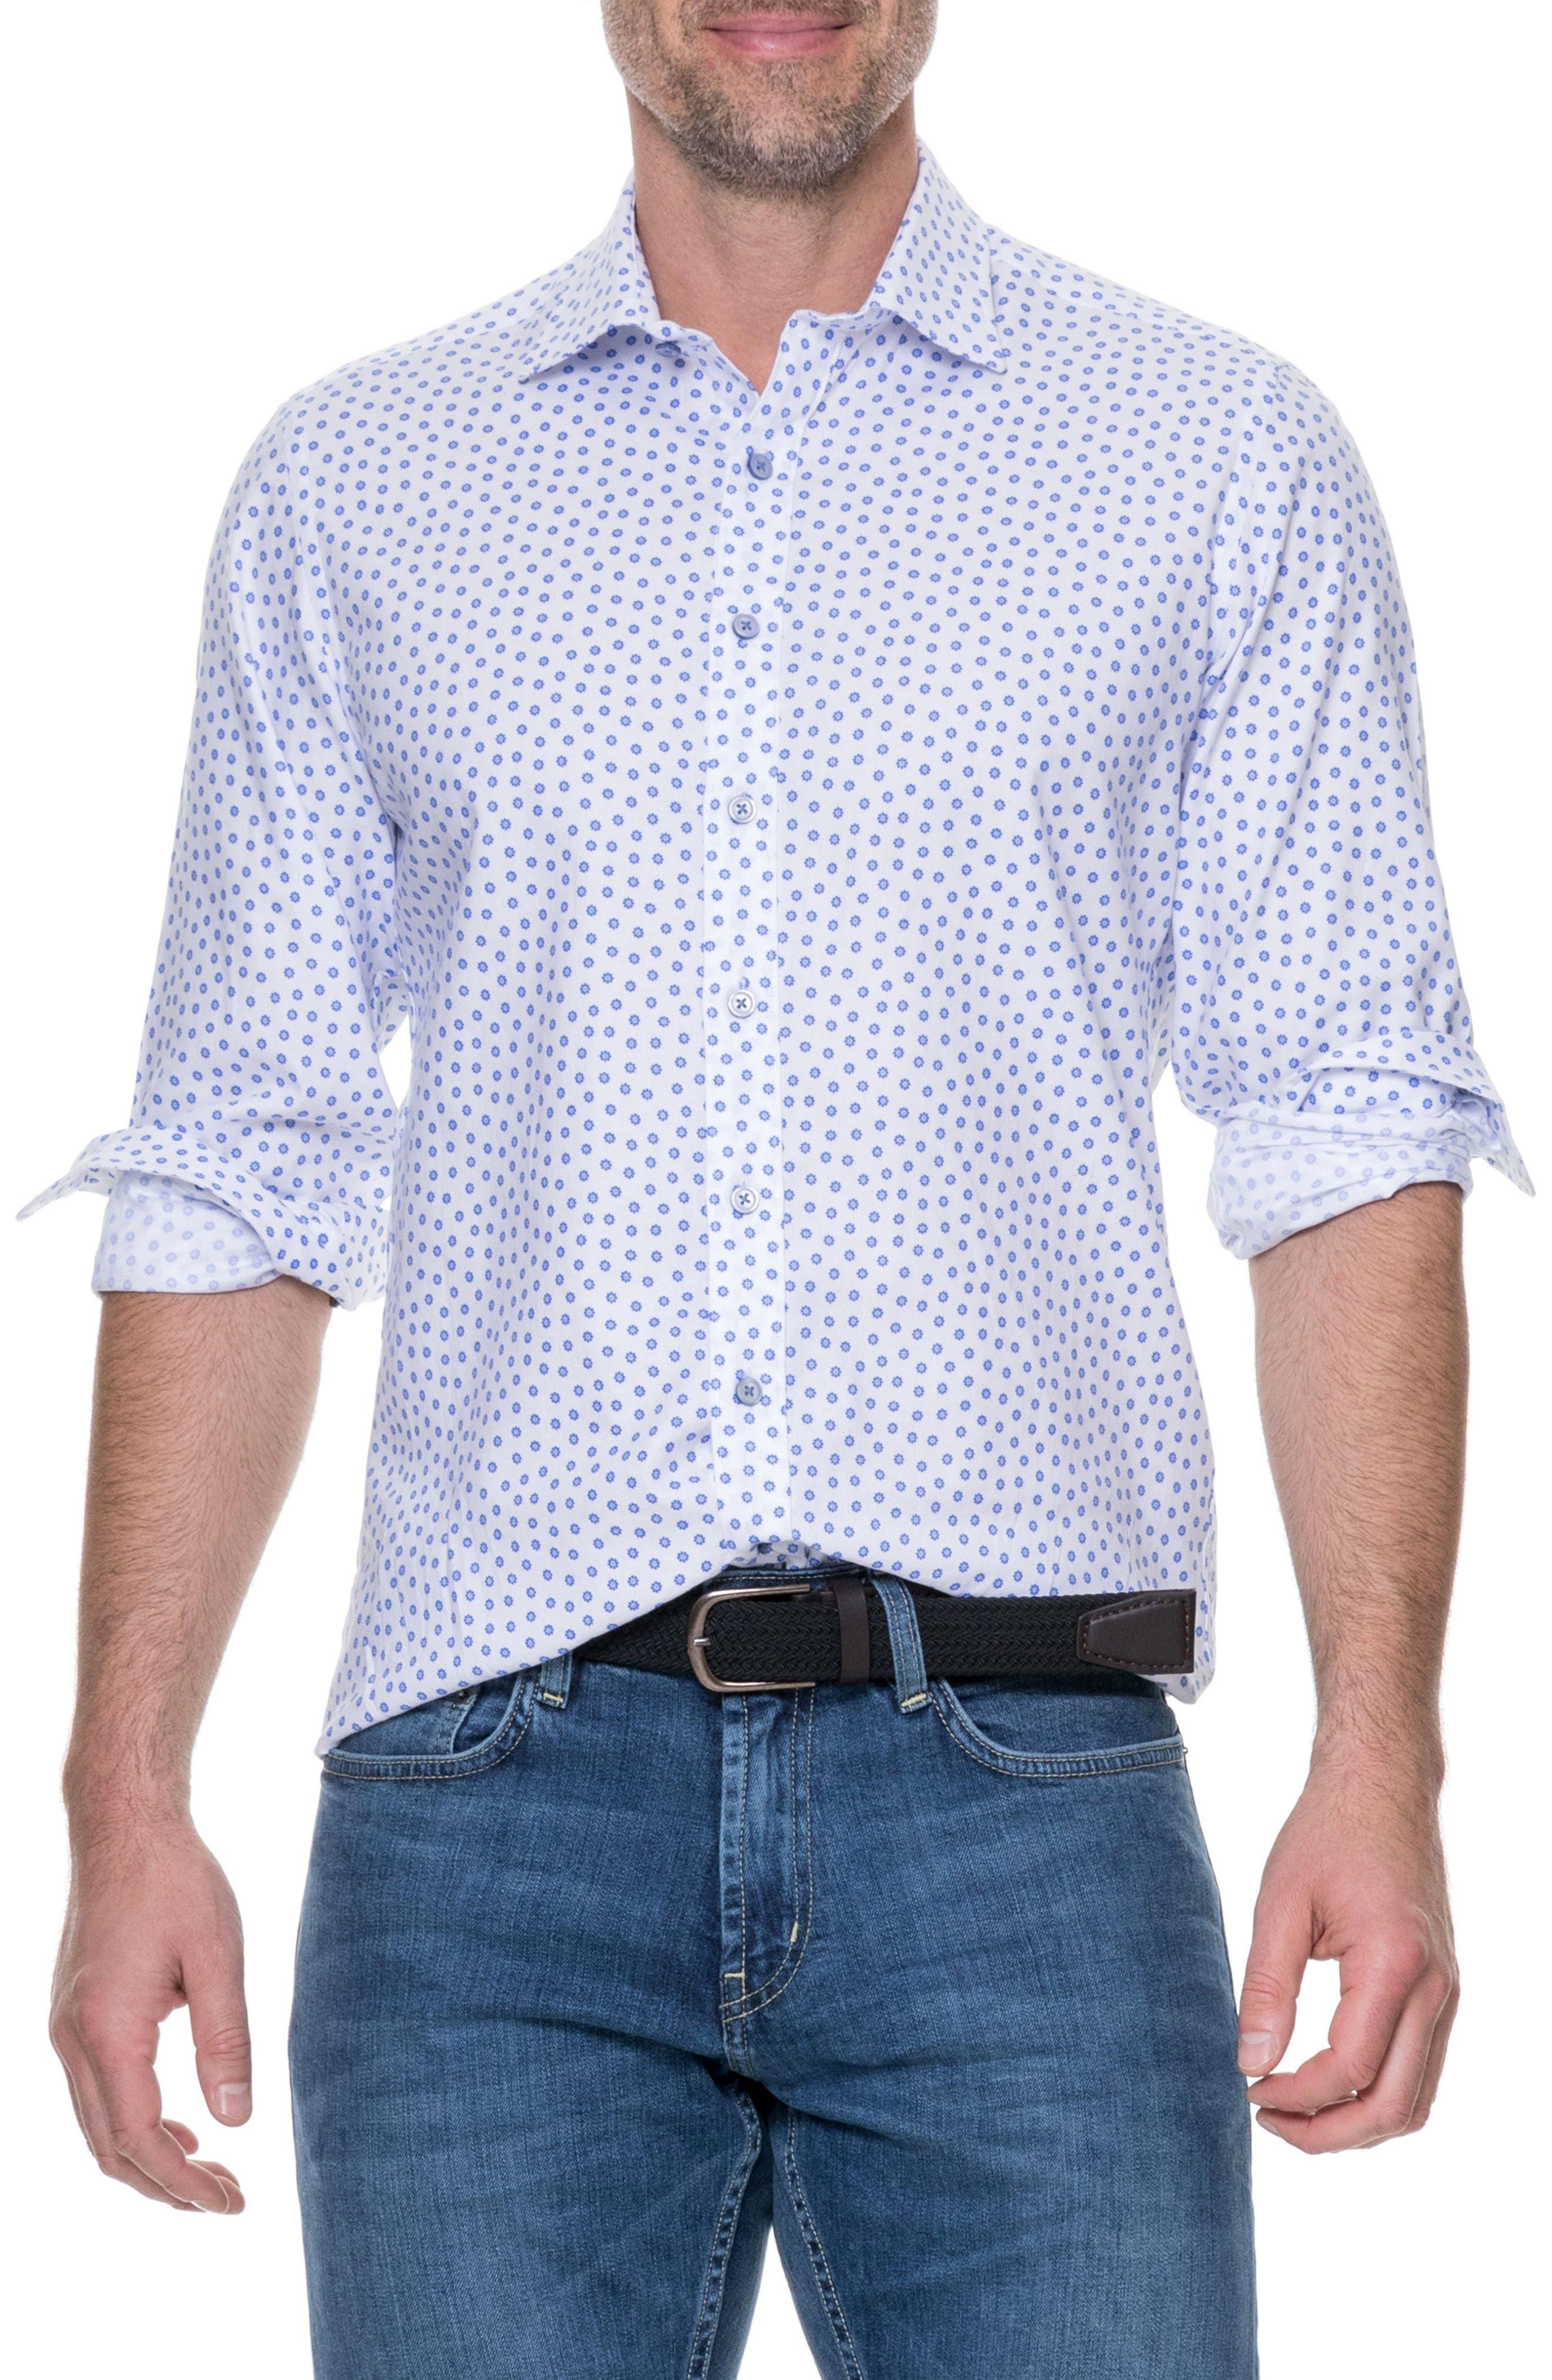 RODD & GUNN,                             Drummond Regular Fit Sport Shirt,                             Main thumbnail 1, color,                             111